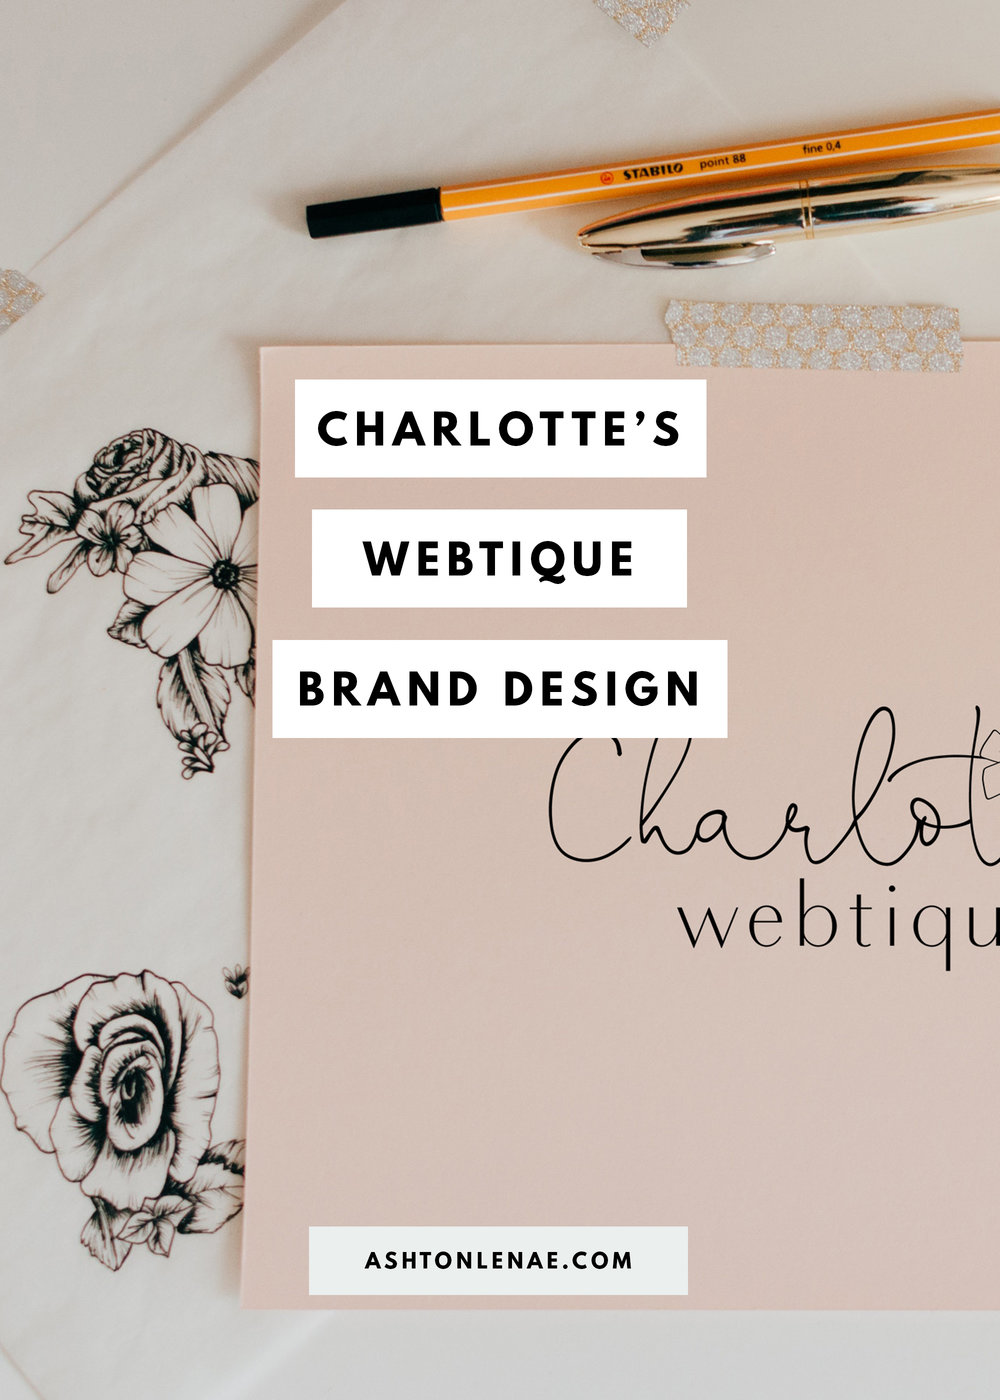 Charlotte's Webtique Brand Design Case Study